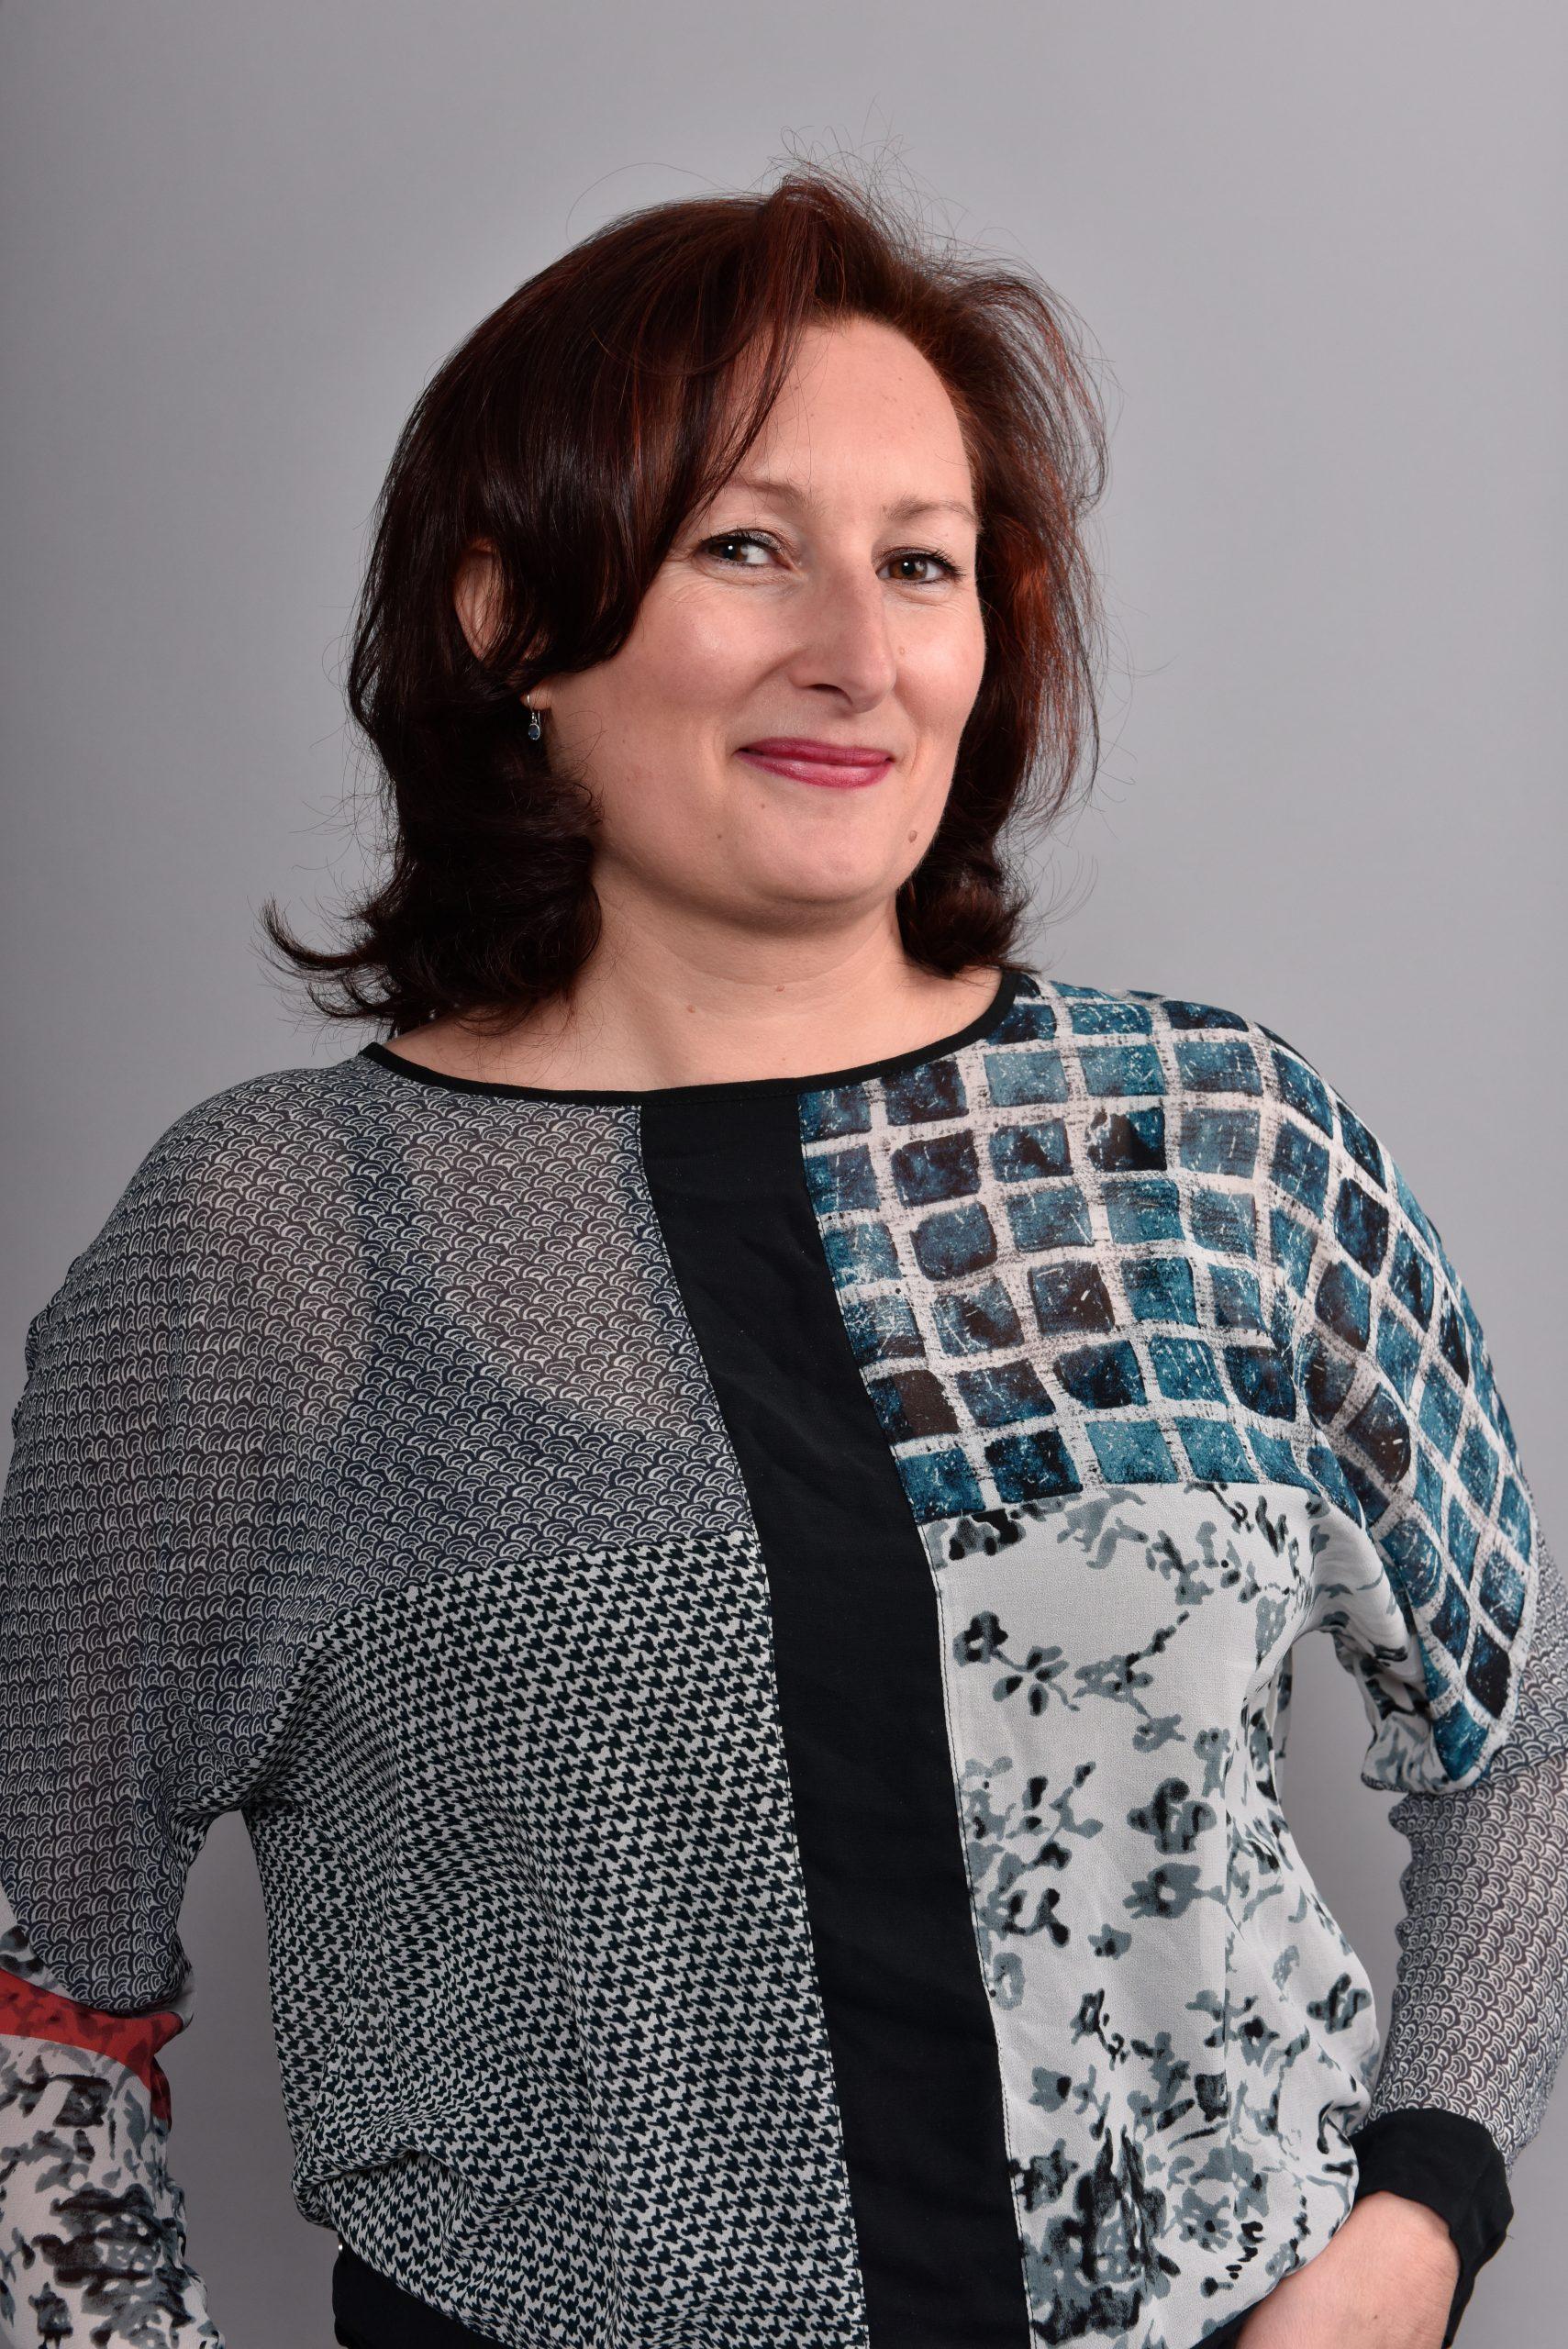 Nathalie Beaumont